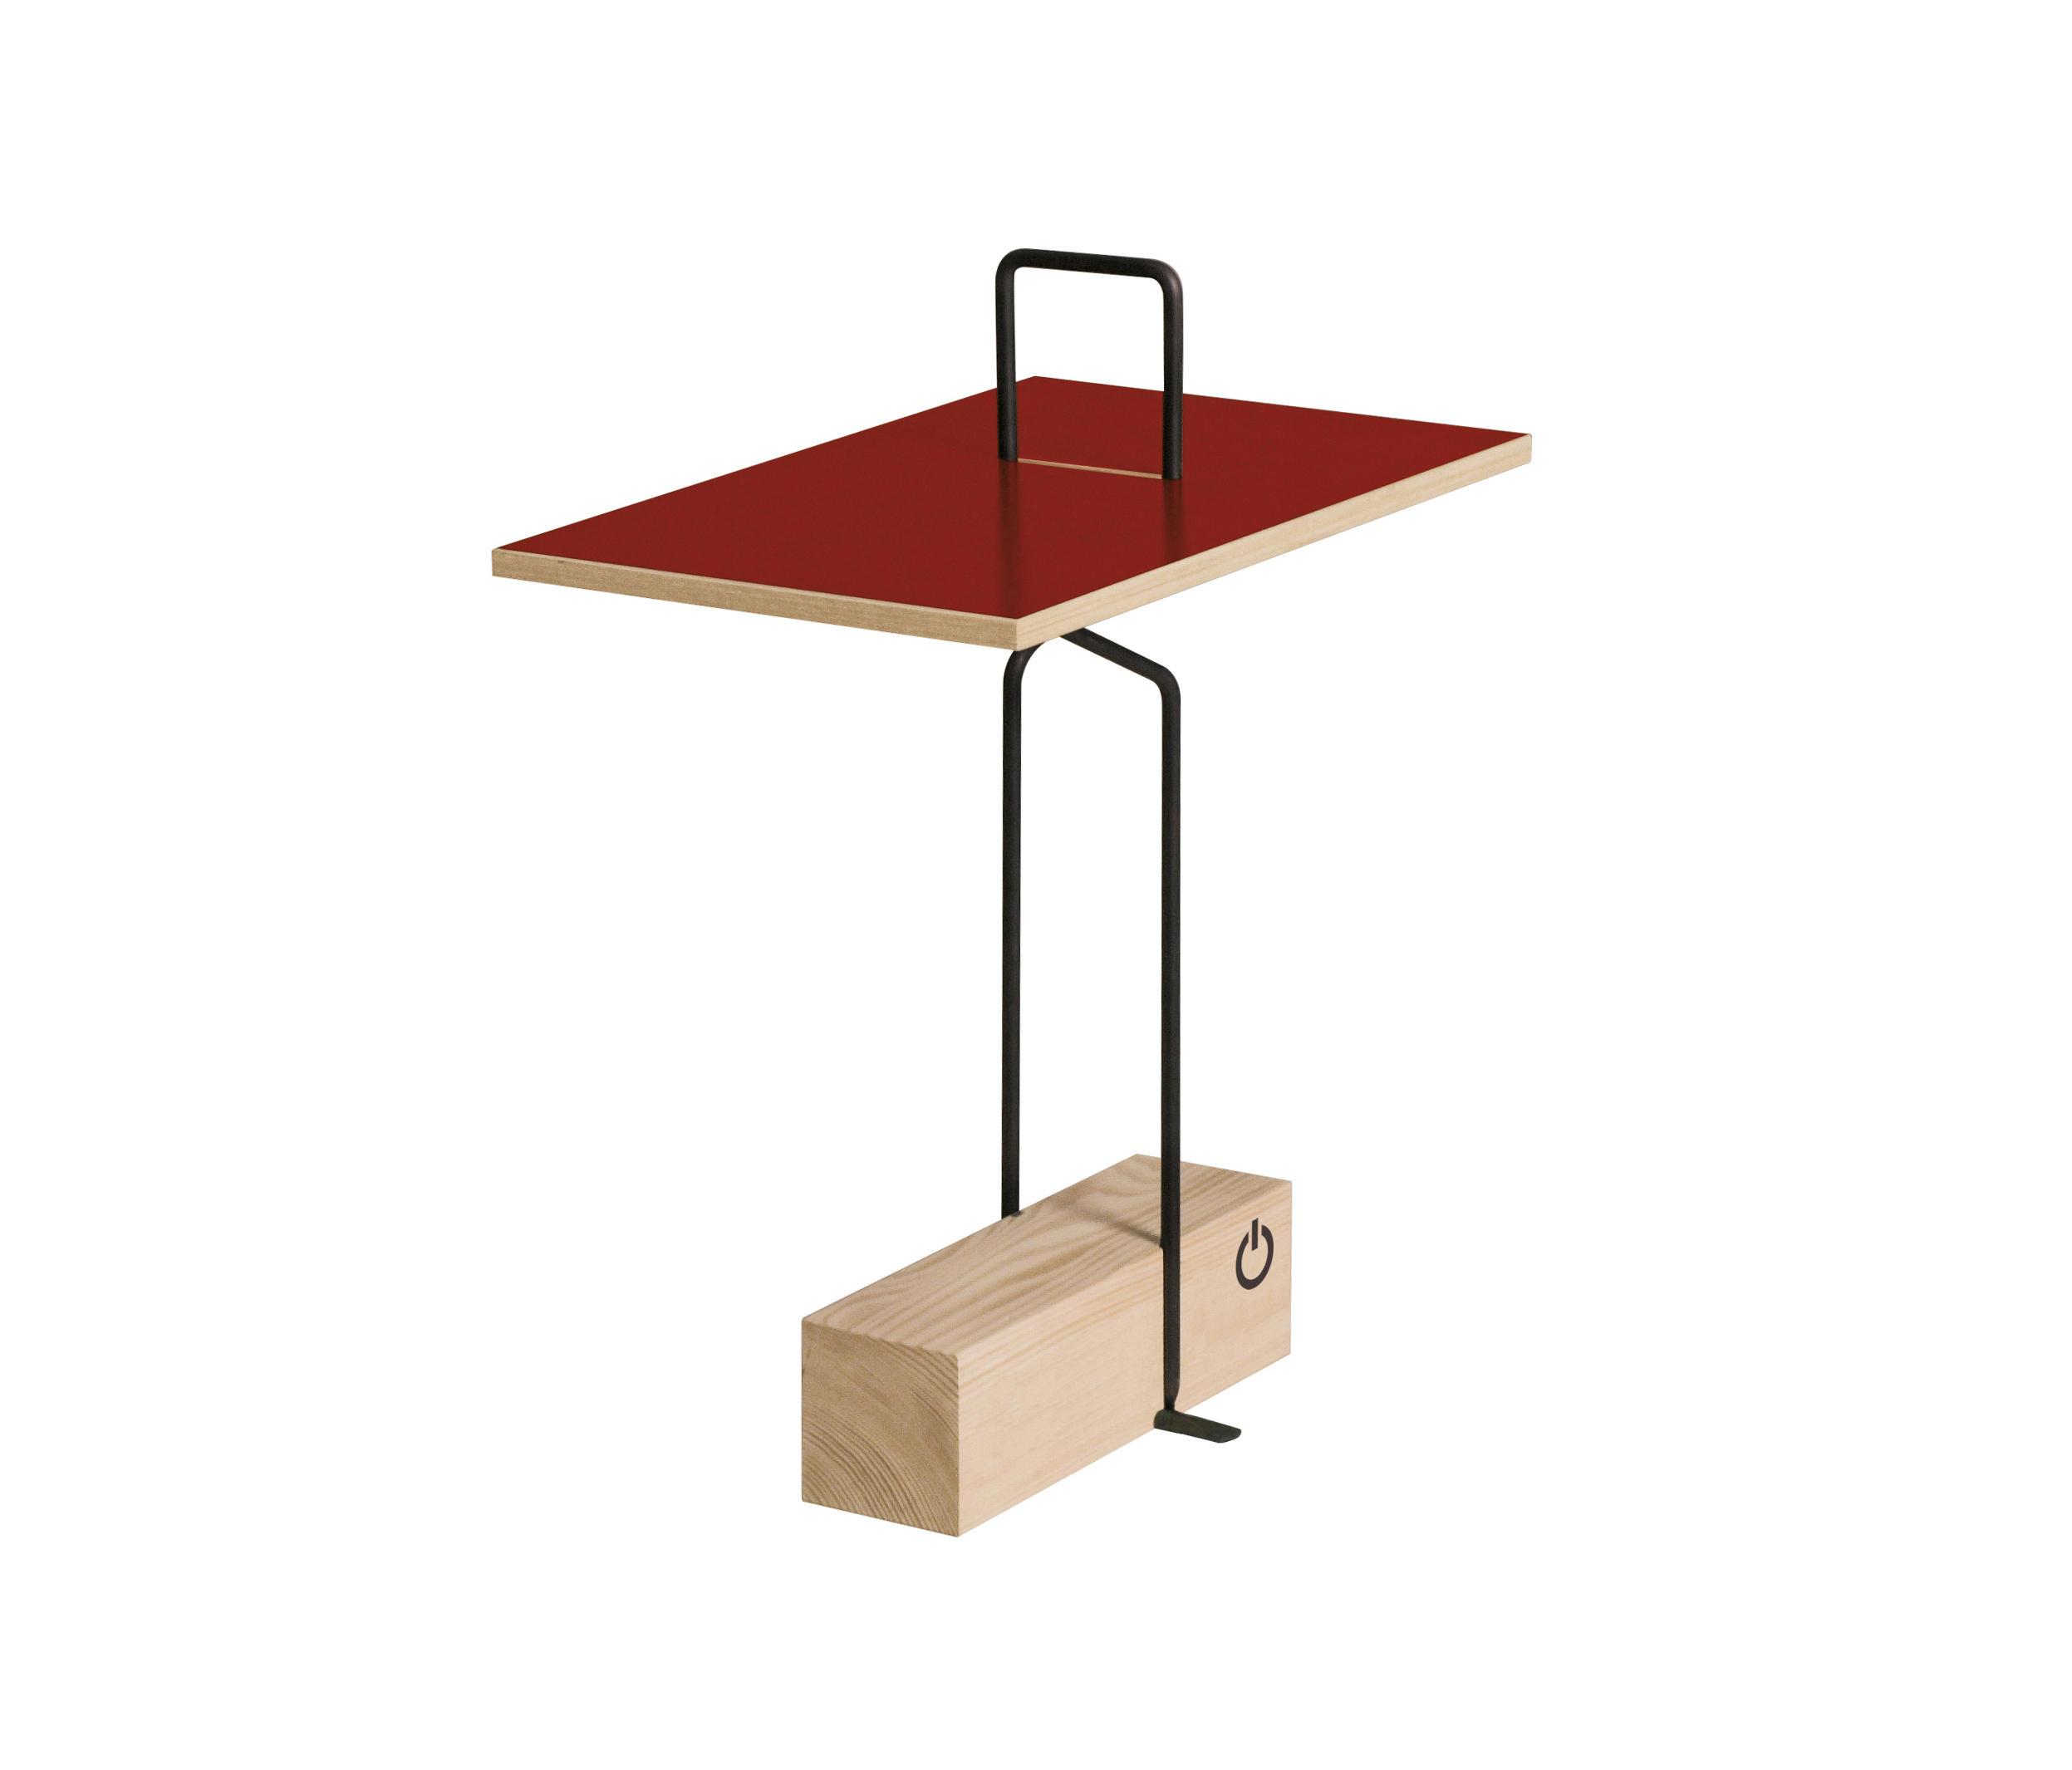 abgemahnt mesas auxiliares de nils holger moormann. Black Bedroom Furniture Sets. Home Design Ideas